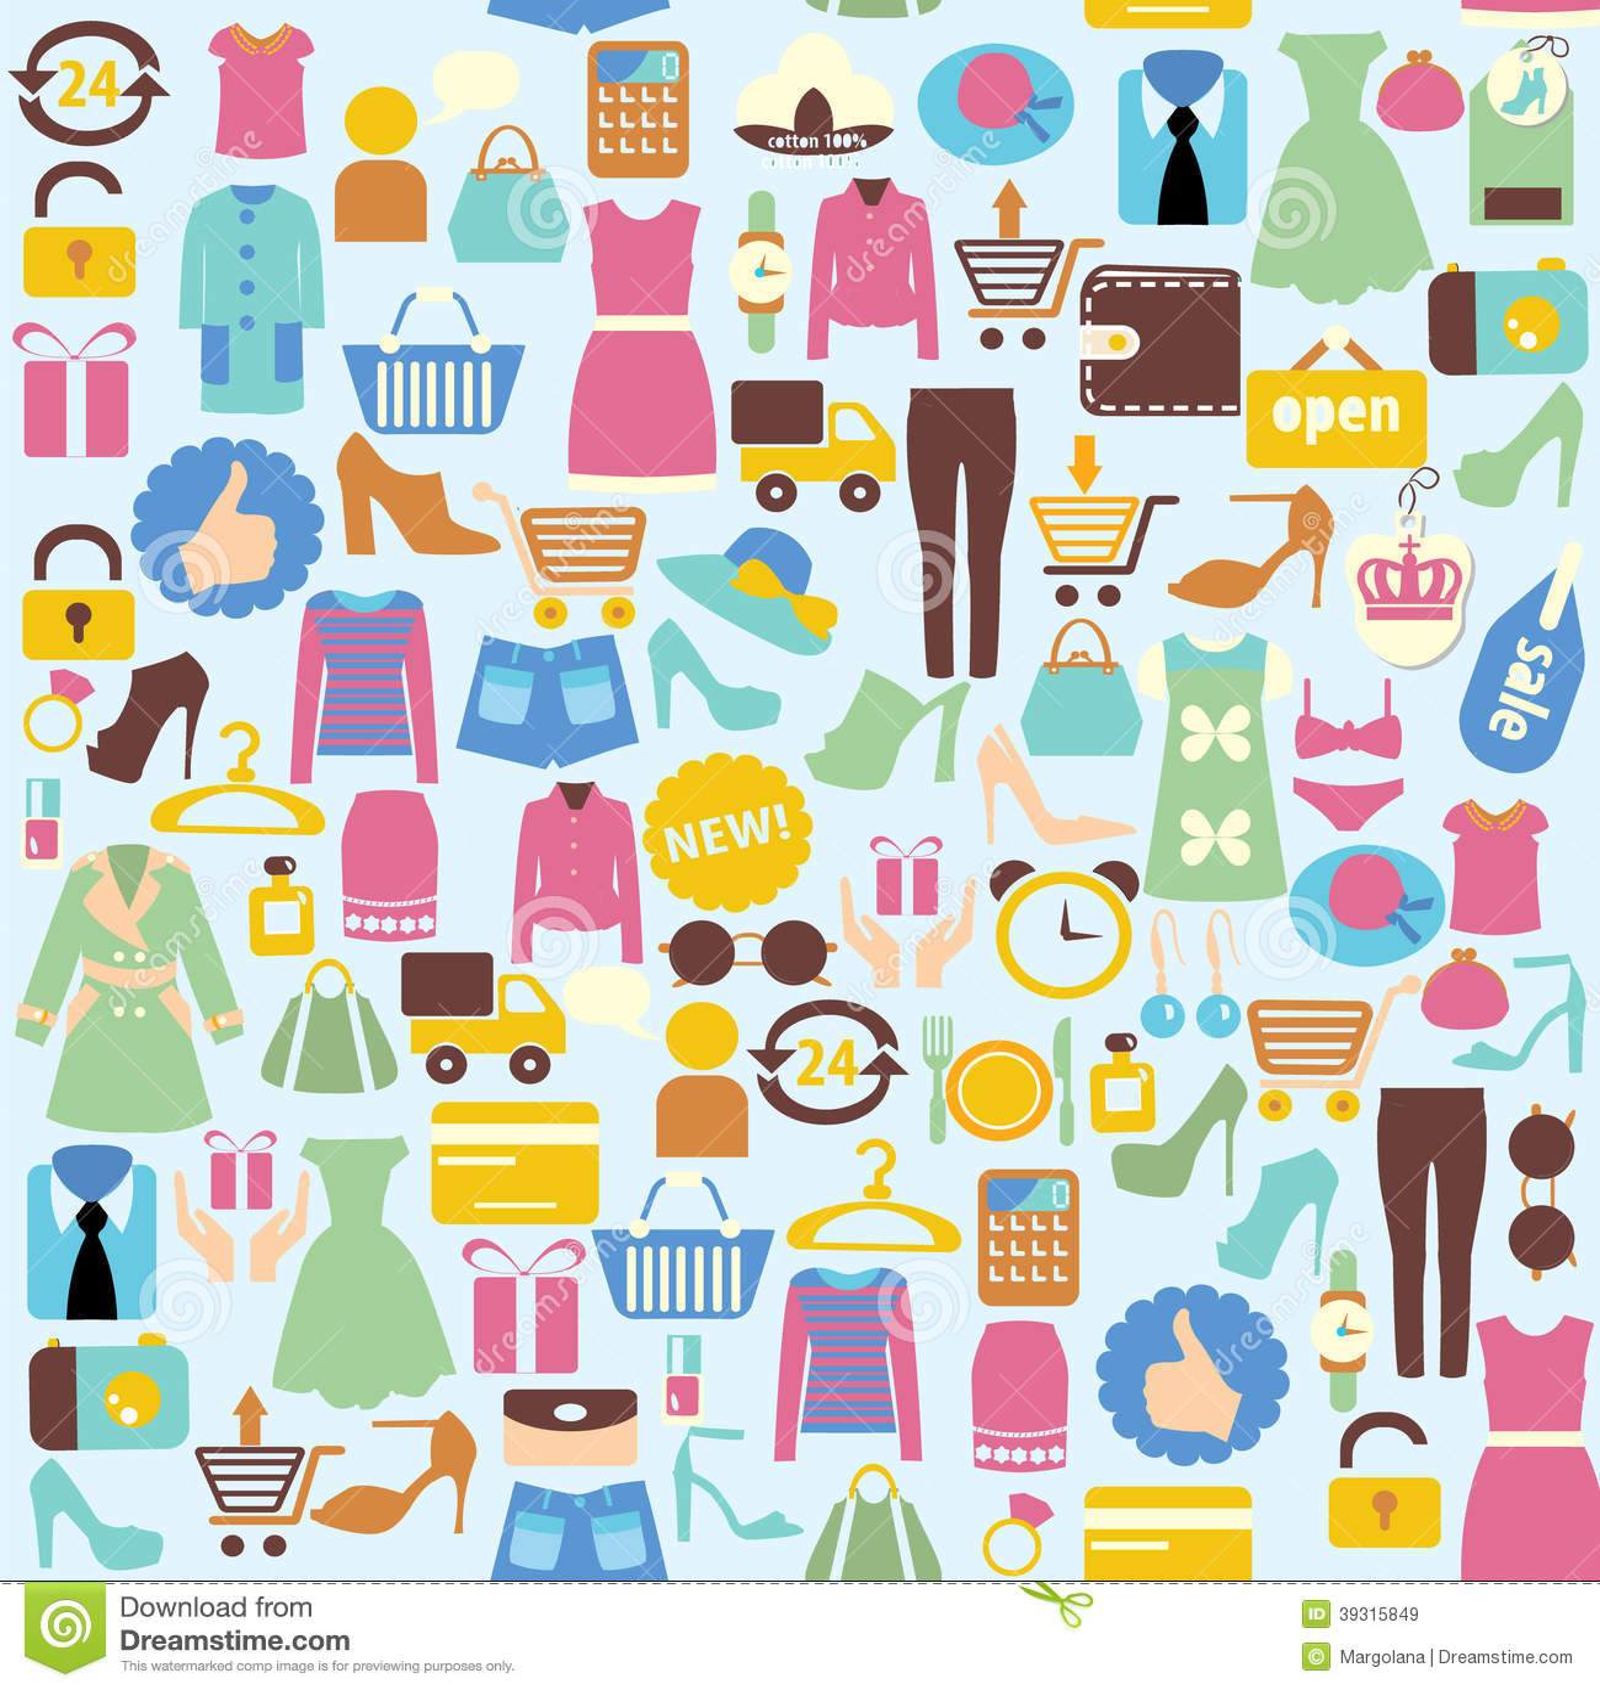 Download Wallpaper Shopping Online Download Lengkap